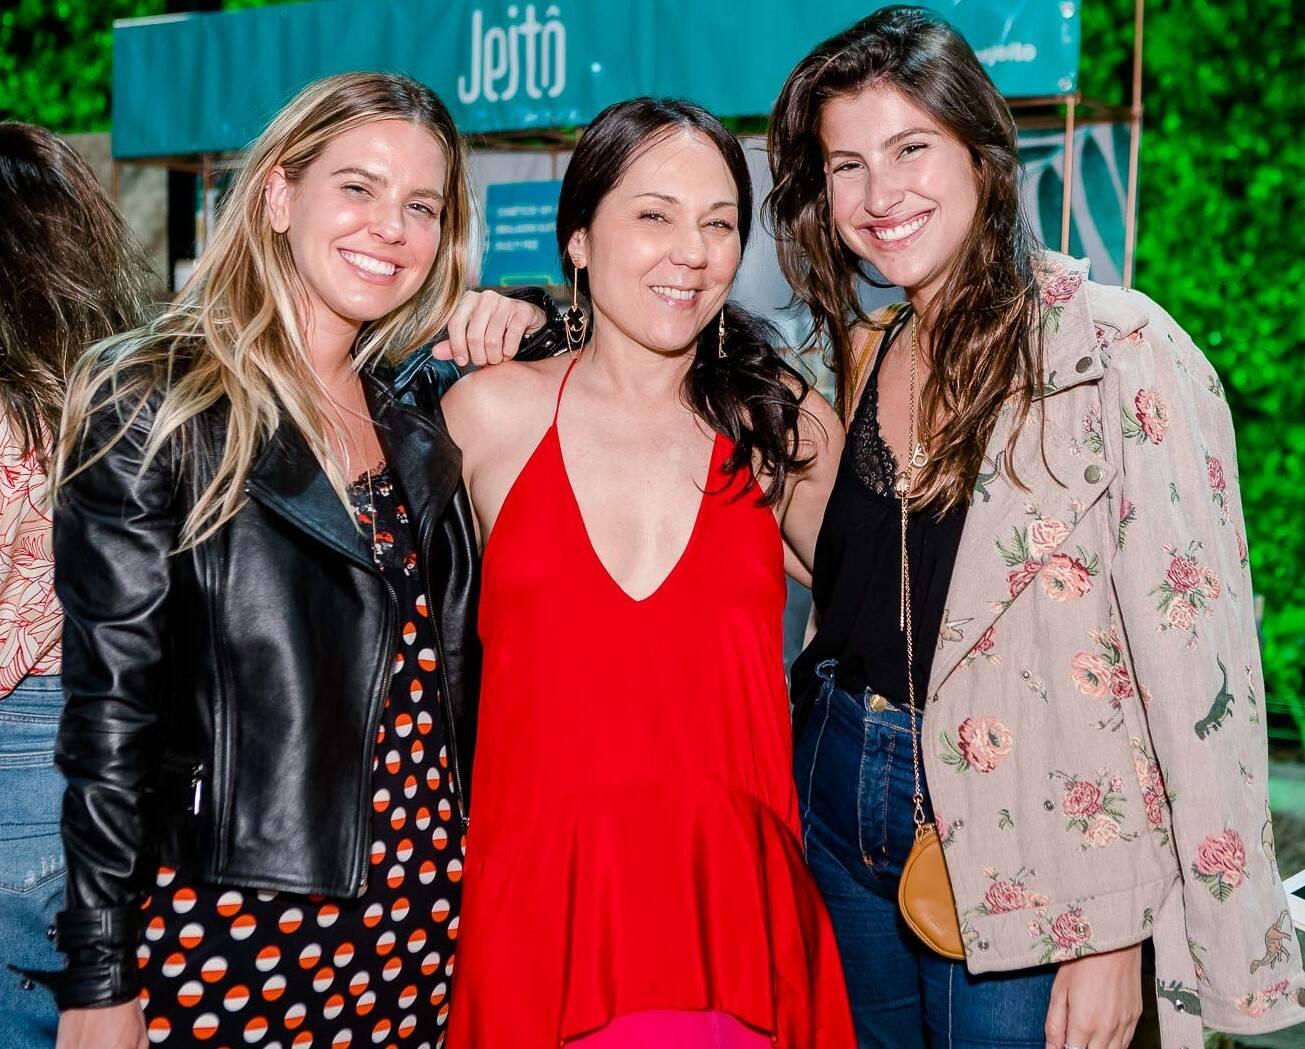 Nathalia Medeiros,  Tati Accioli e Lara D'ávila  /Foto: Bruno Ryfer